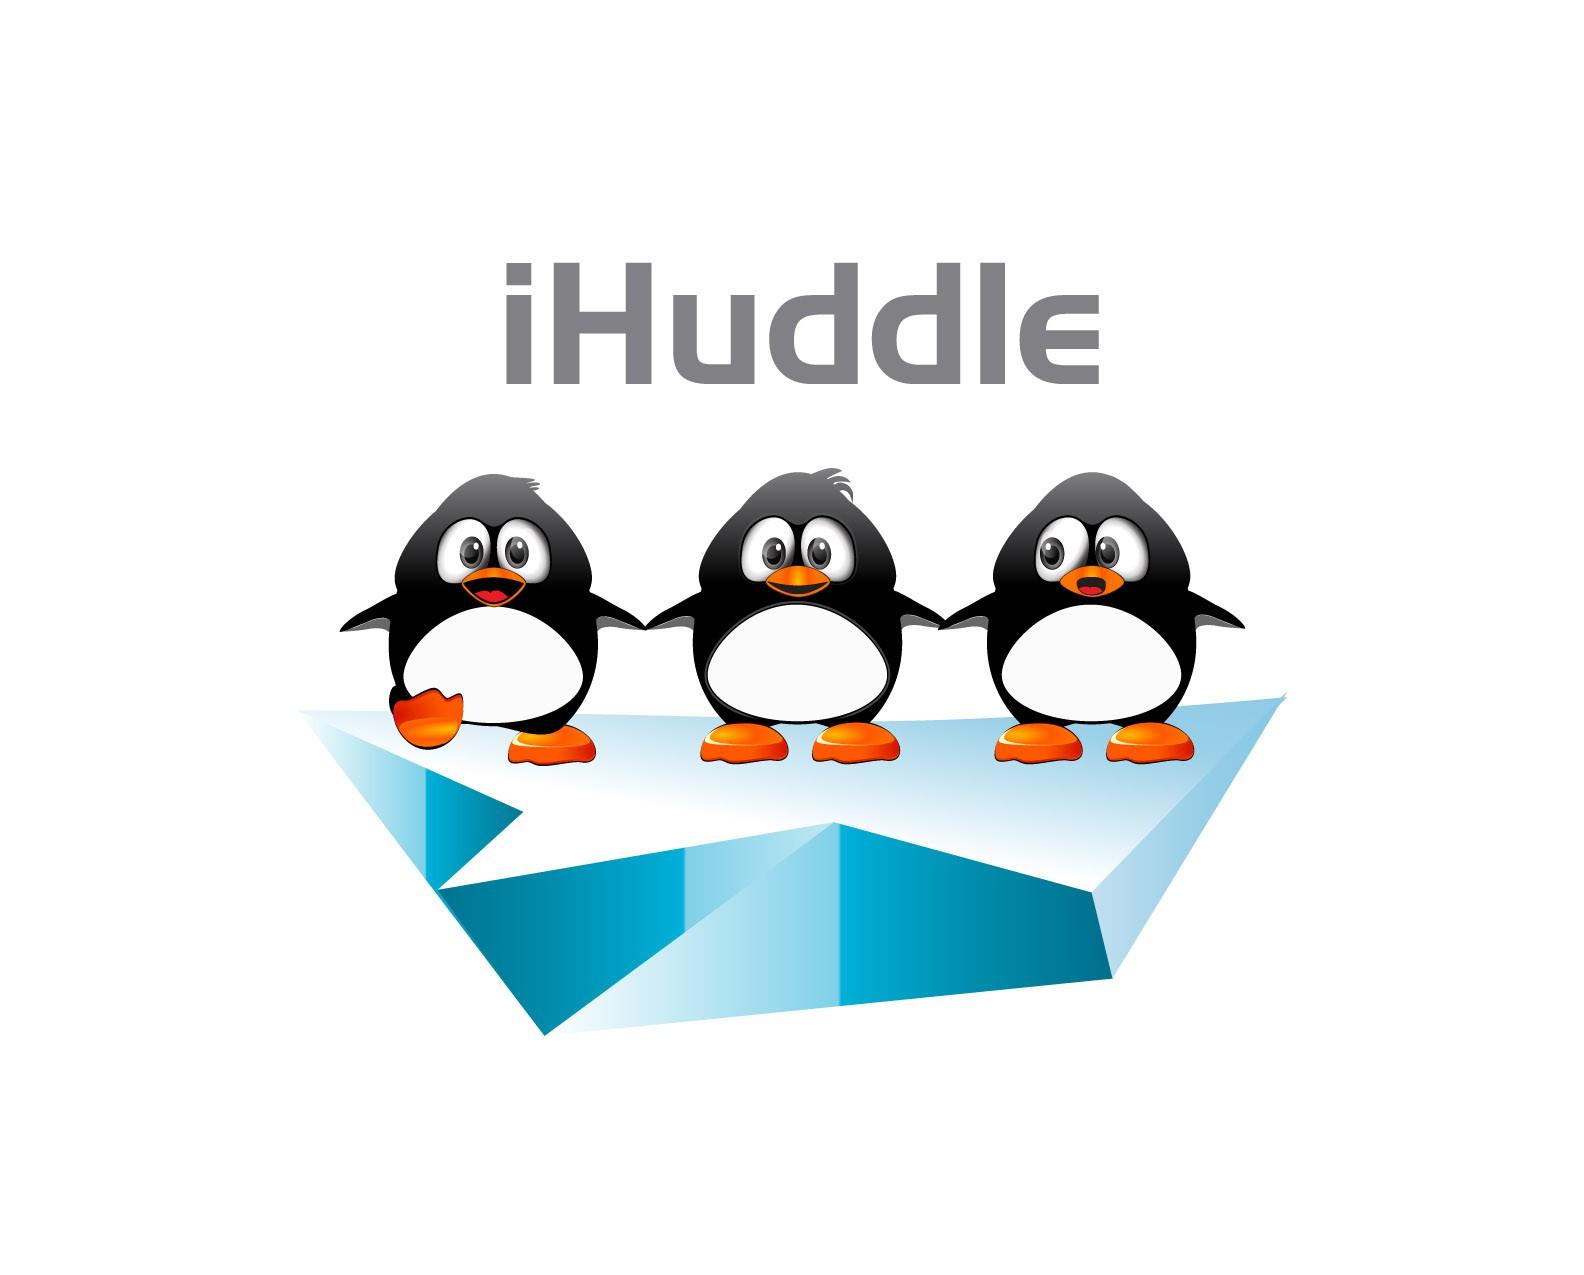 Logo of penguins huddling together for an awesome sports social network / mobile app